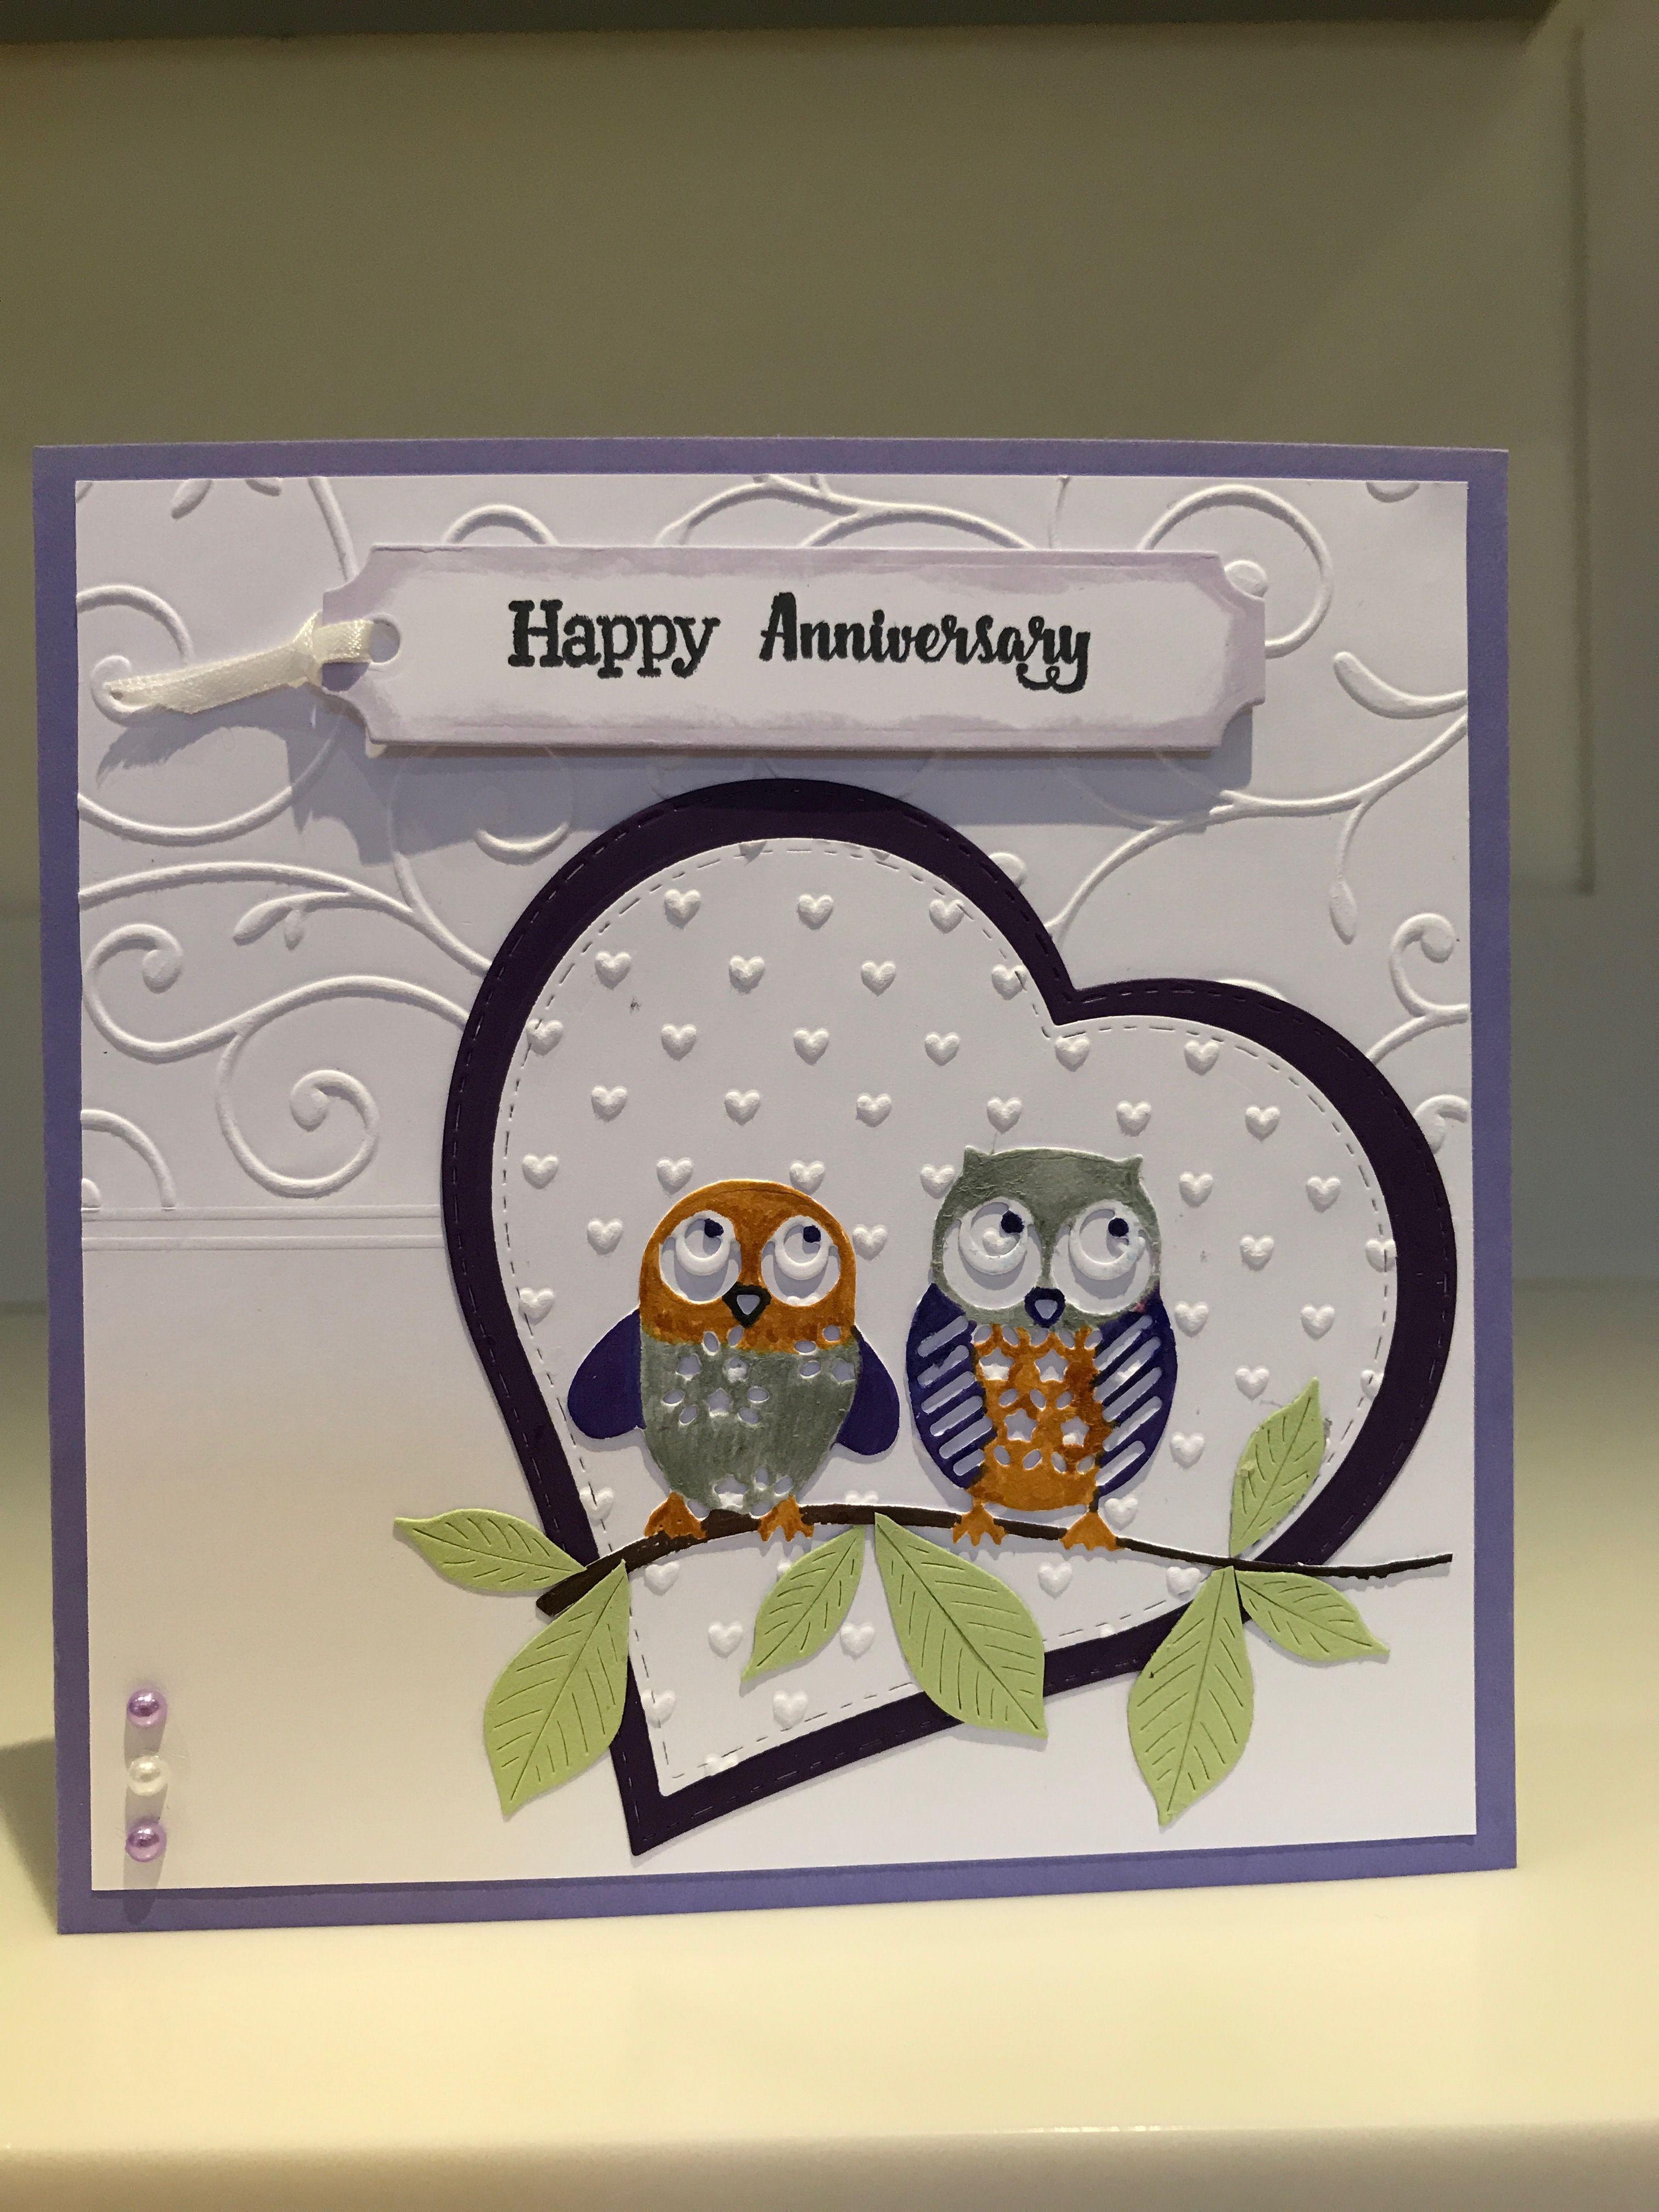 For Mum Dad G Anniversary Cards Handmade Birthday Card Design Anniversary Cards For Husband